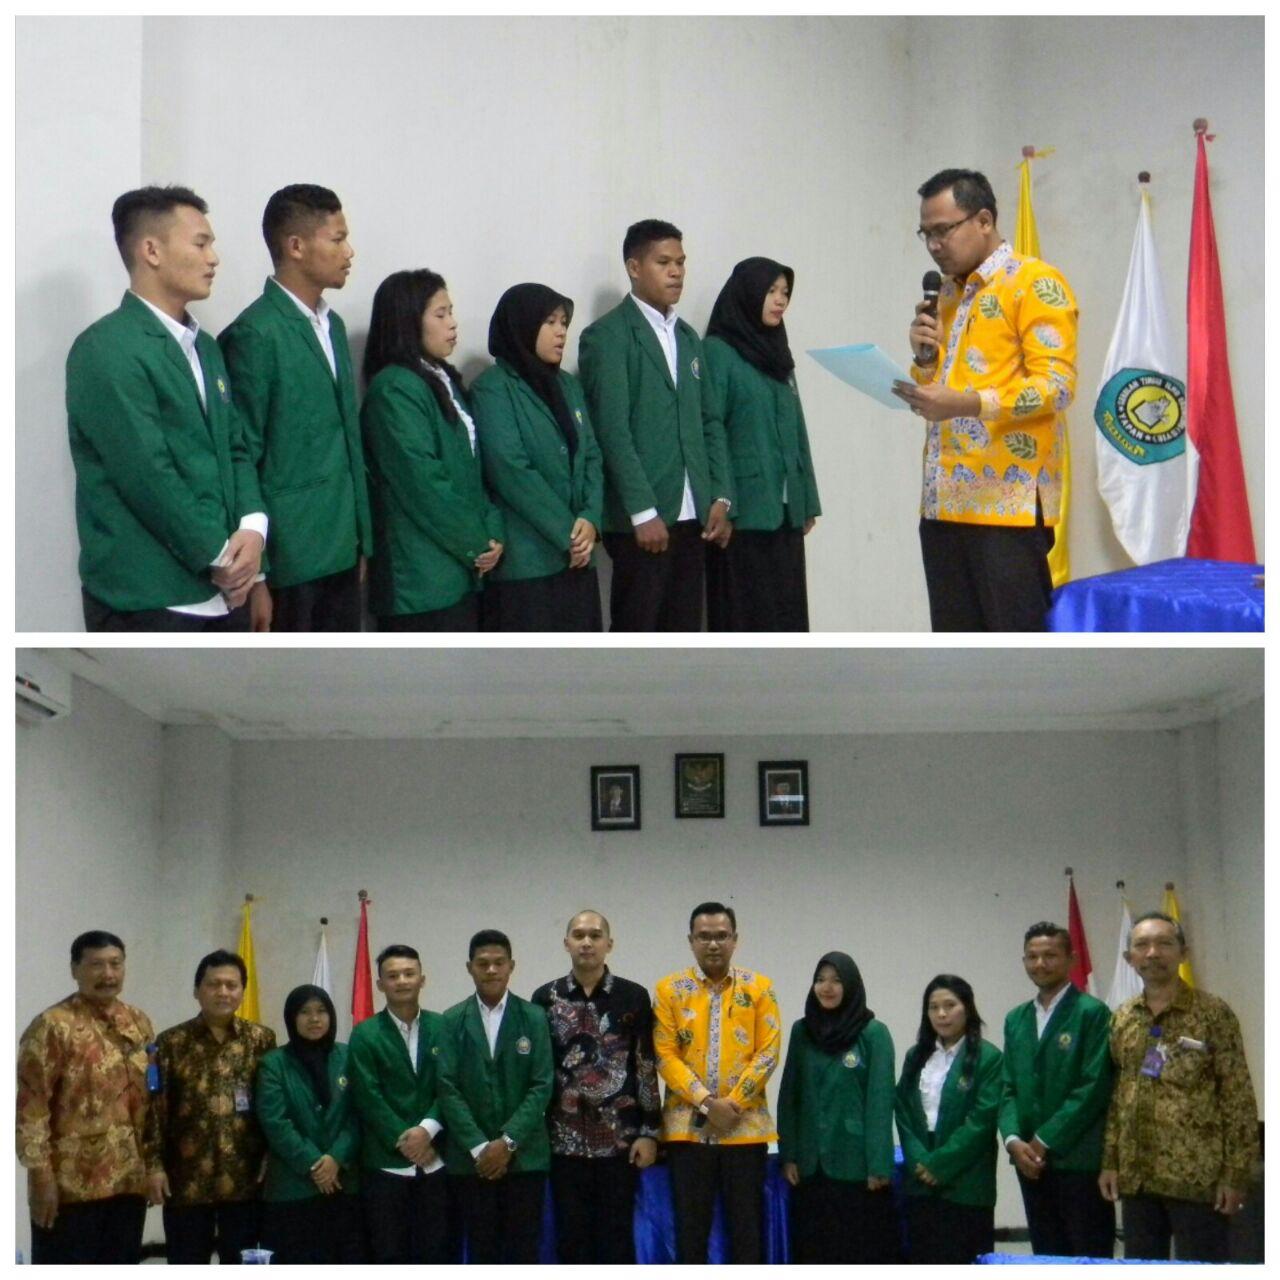 Pelantikan Ketua dan Anggota BEM STIE YAPAN Surabaya Periode Tahun 2017-2018